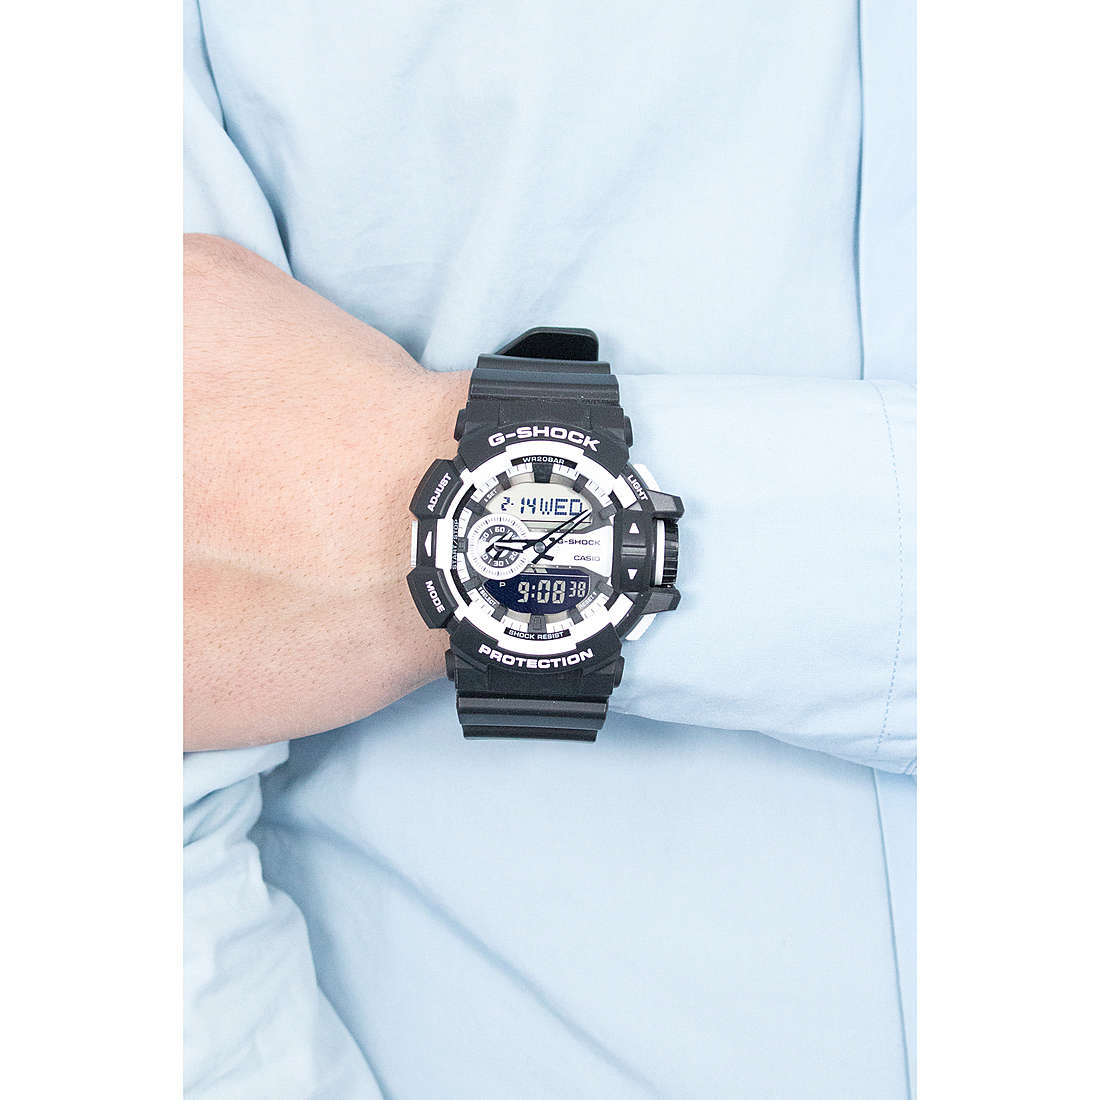 Casio digitali G-Shock uomo GA-400-1AER indosso